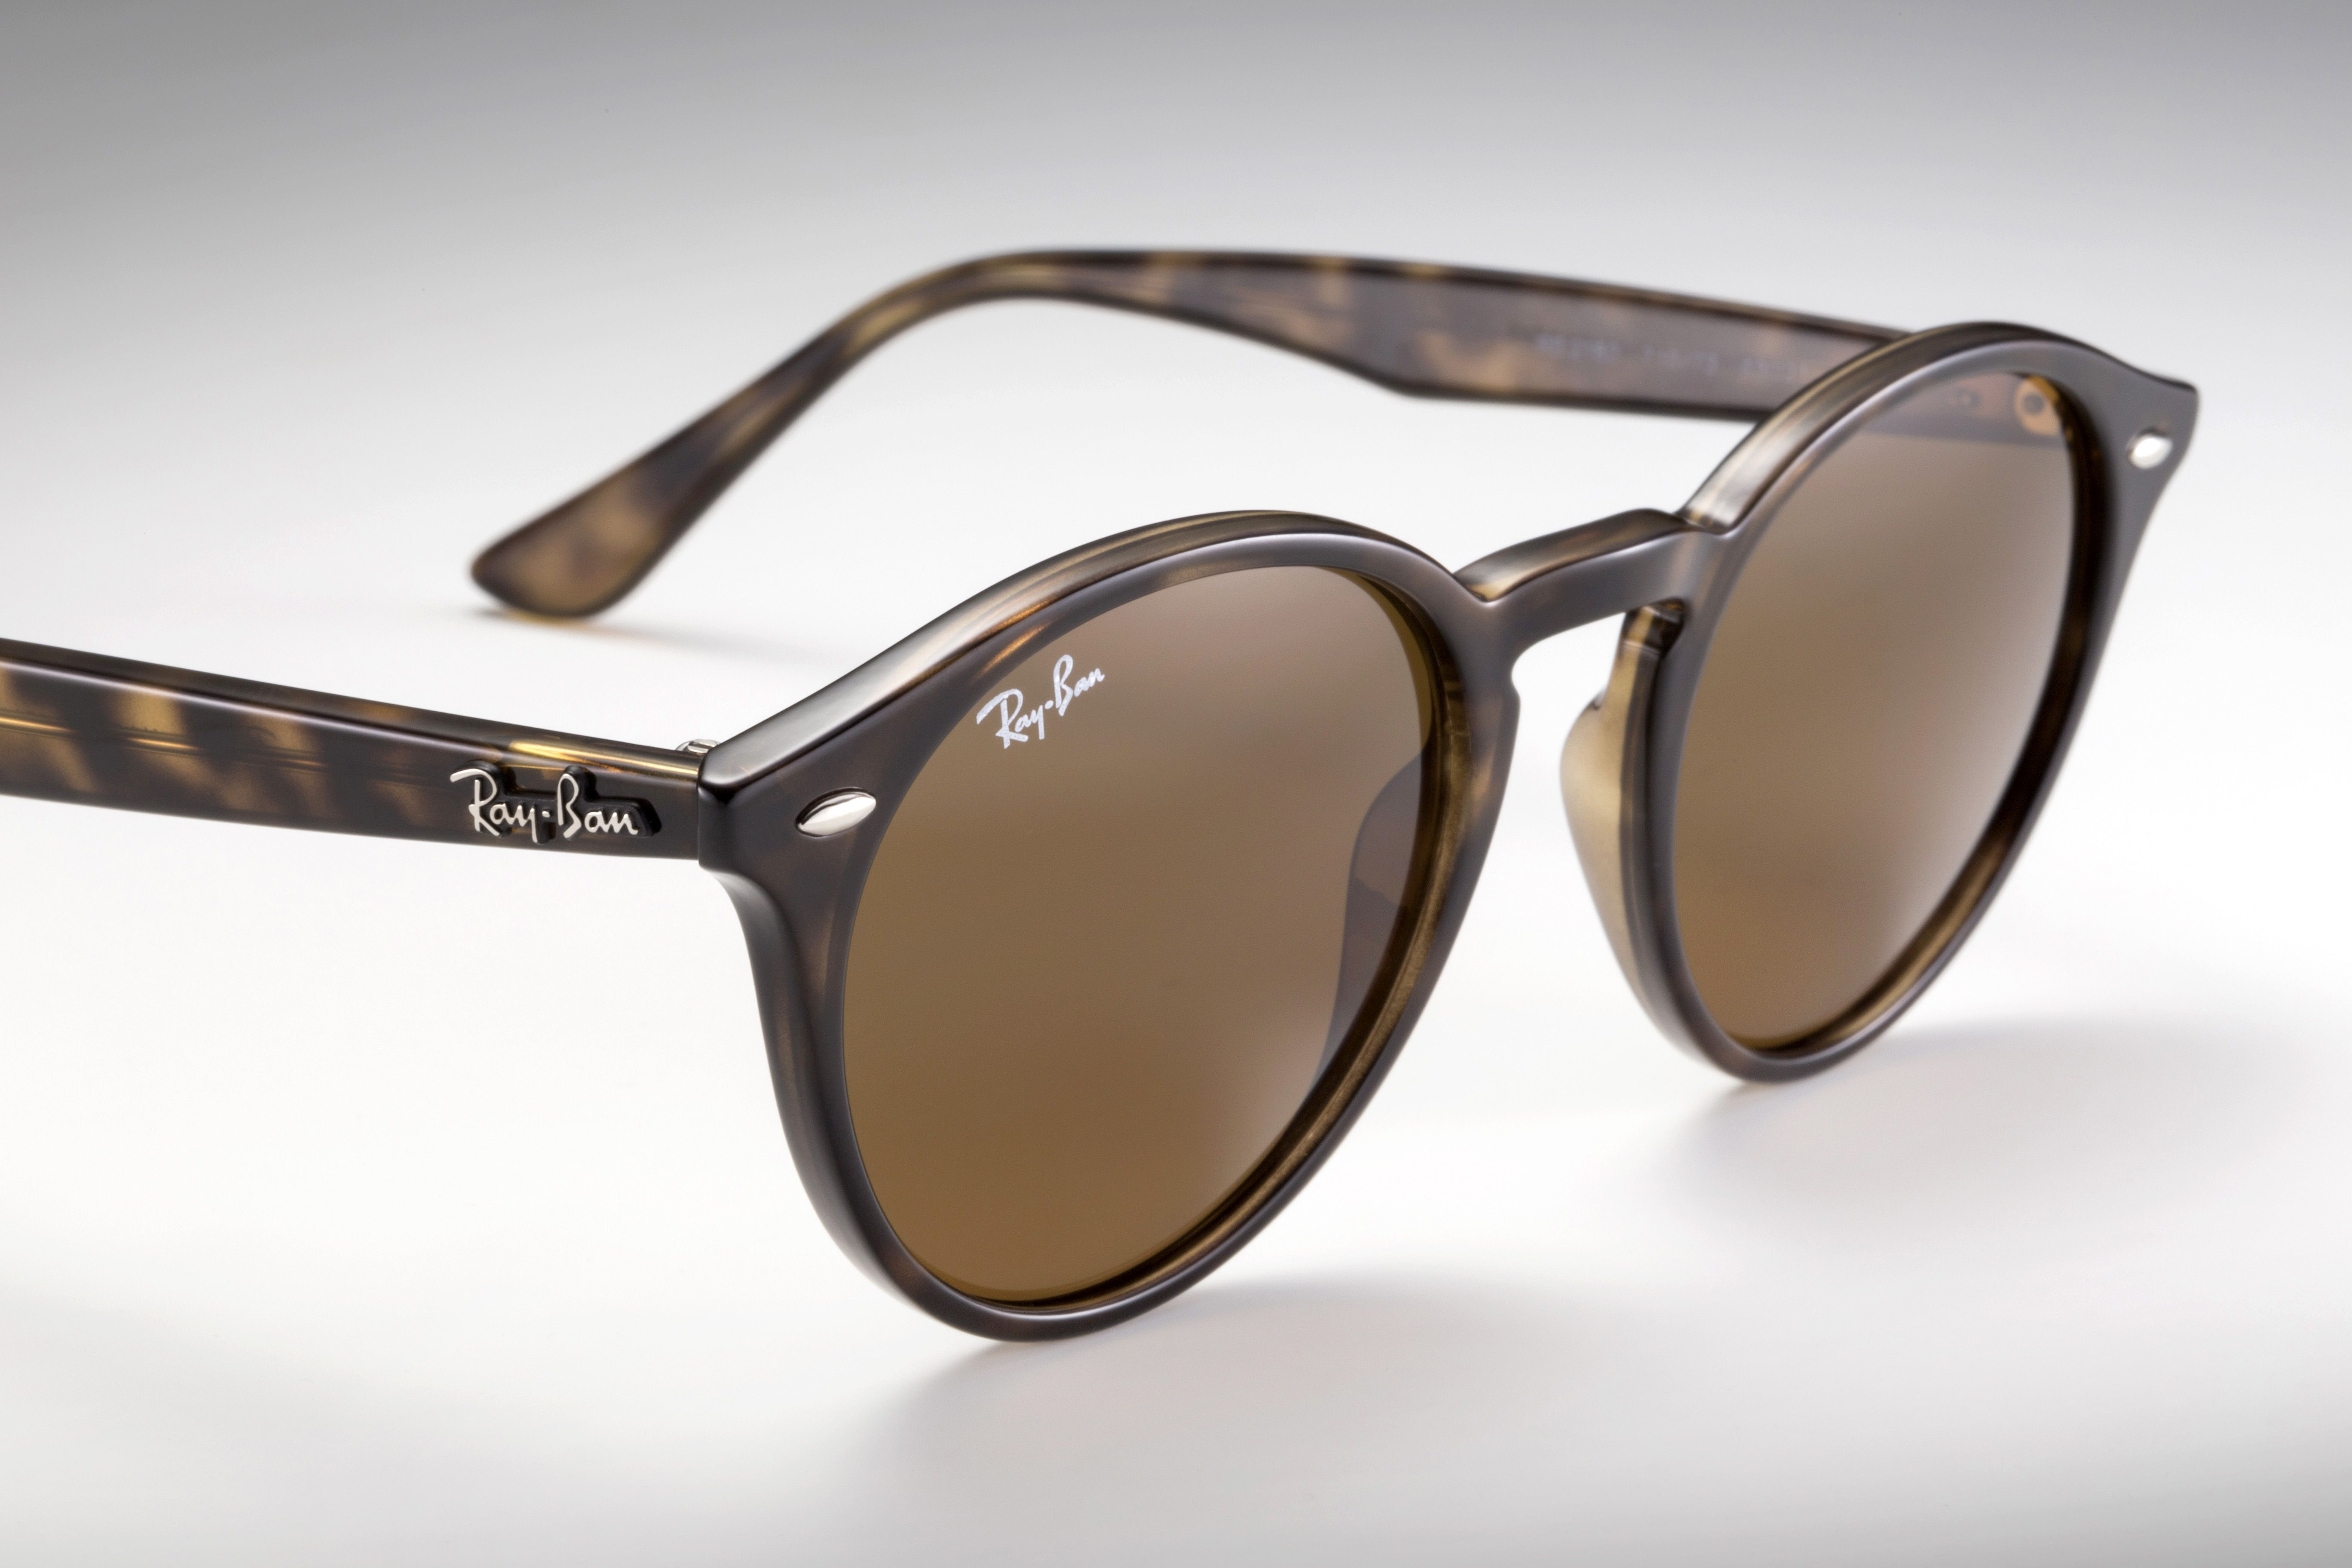 Them's some sharp looking shades // #RayBanRound @ www.ray-ban.com